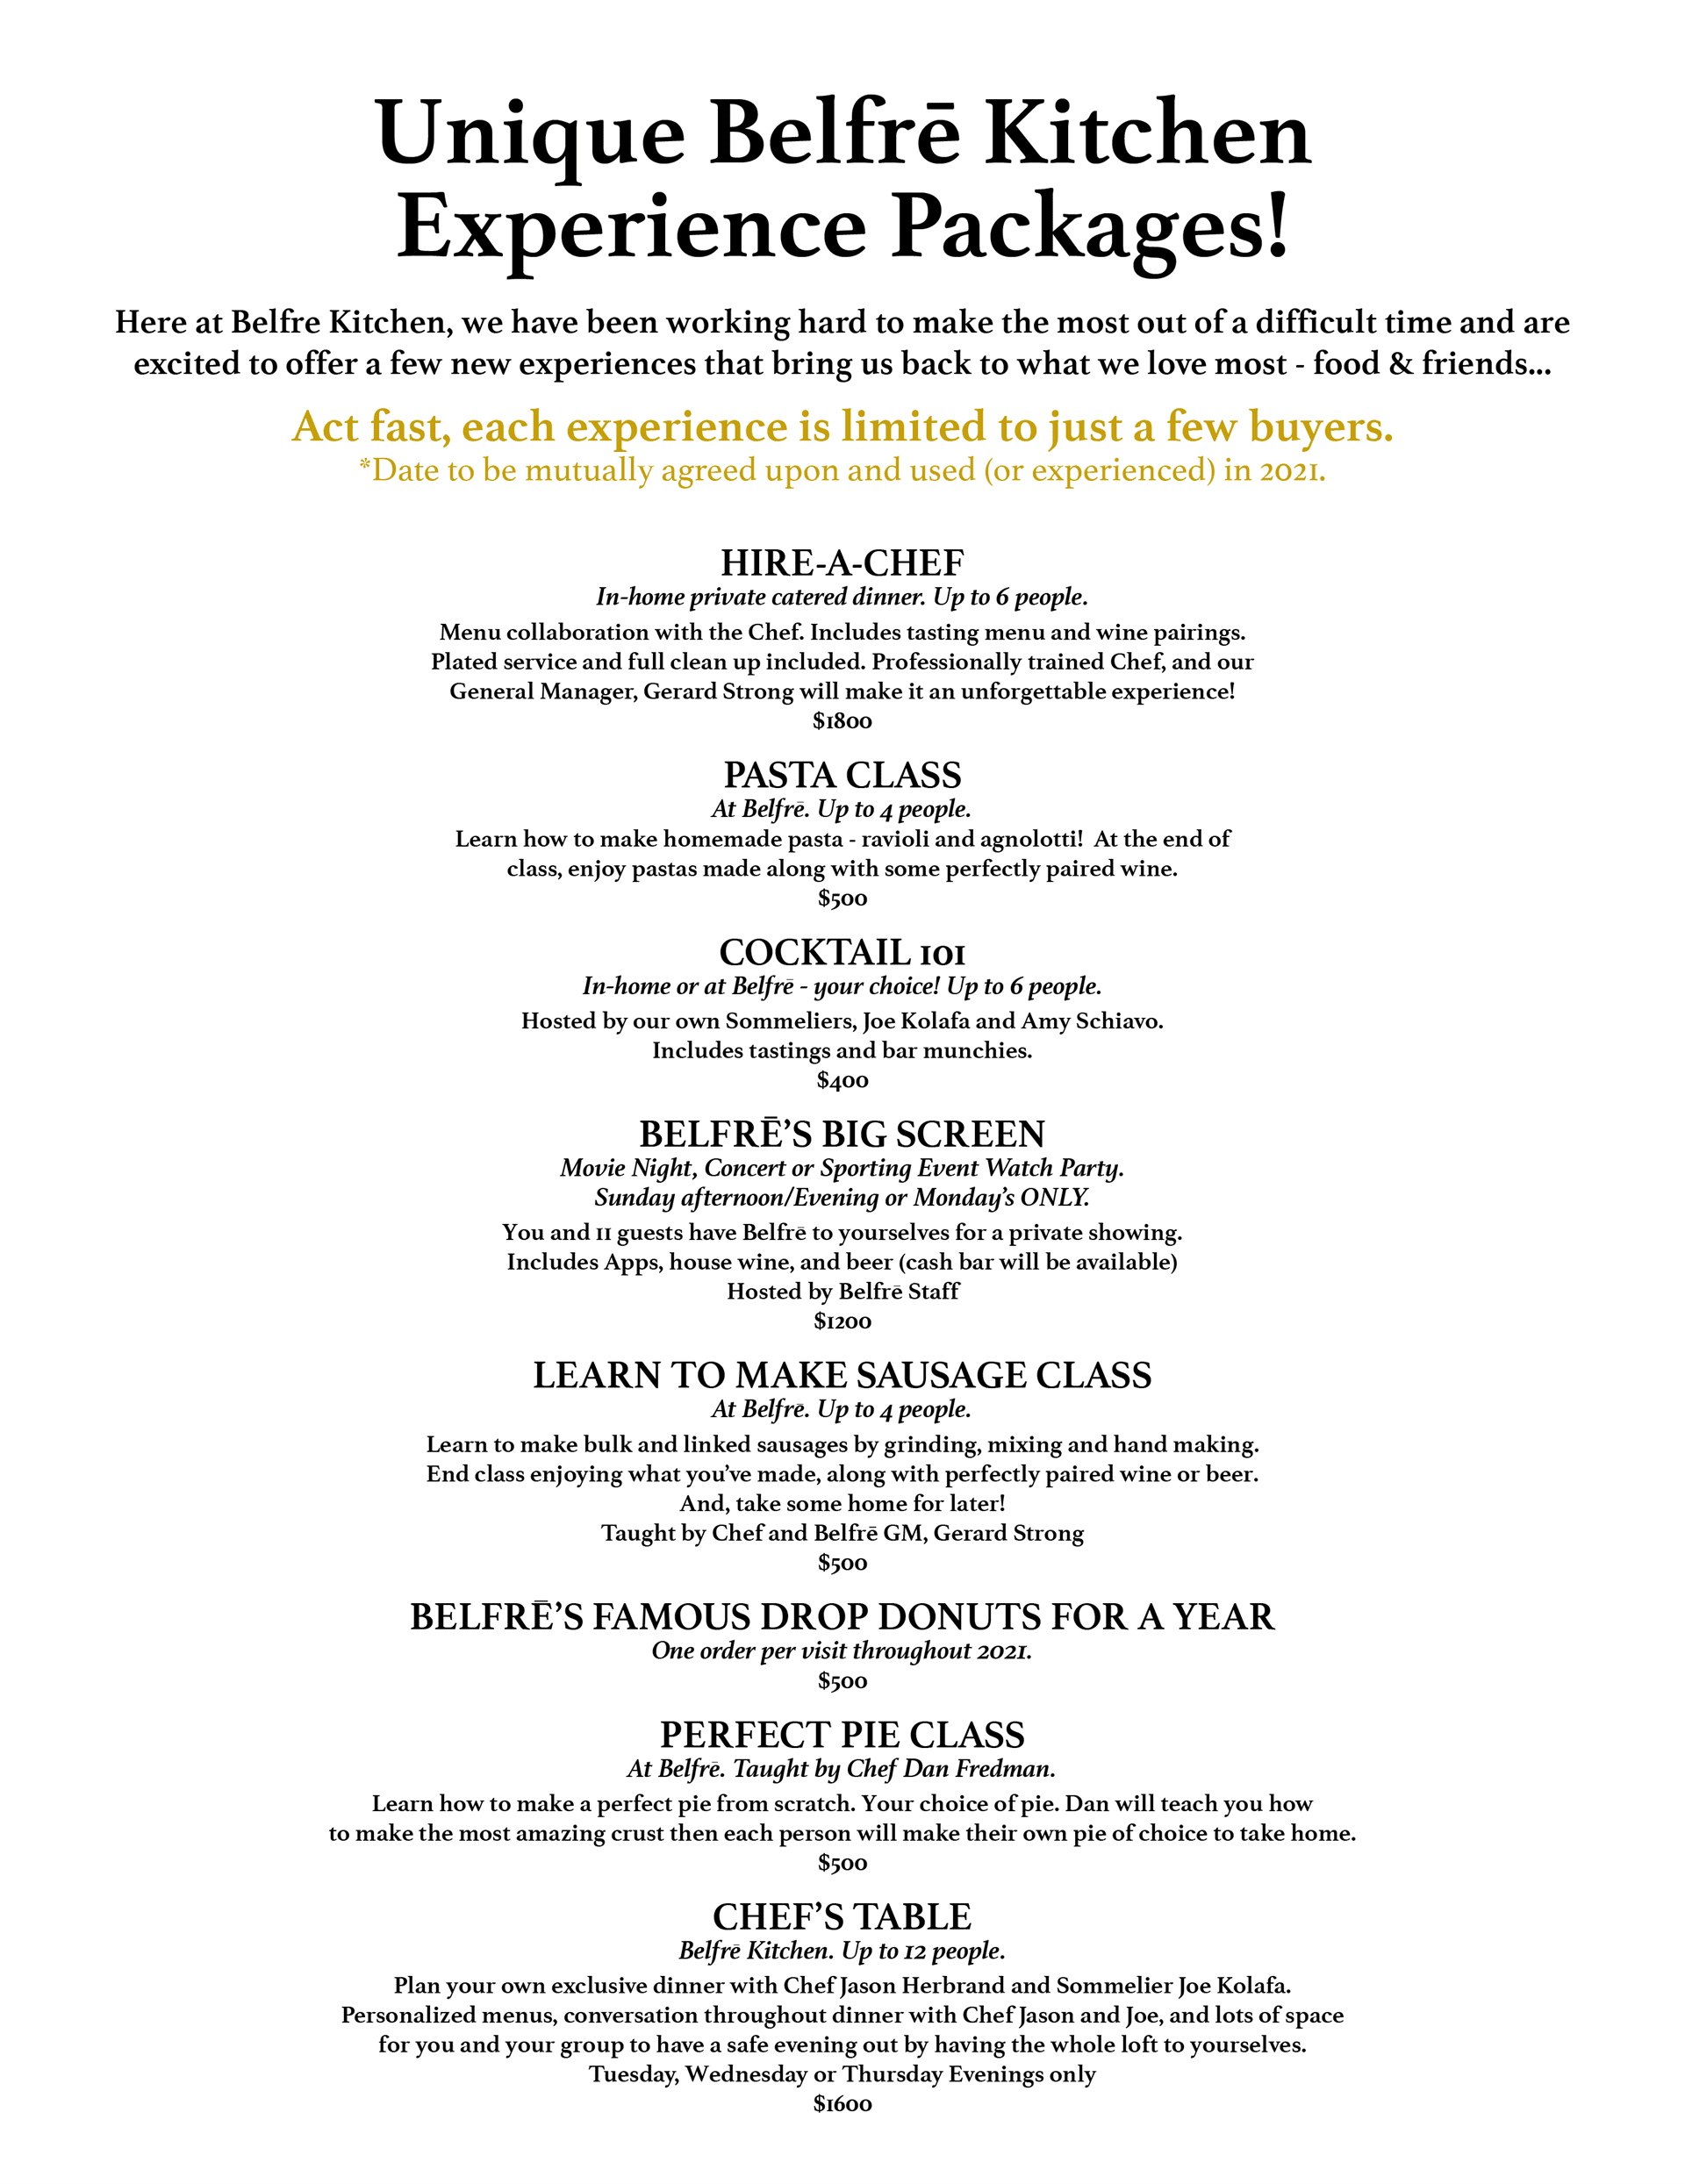 Insider Experience List